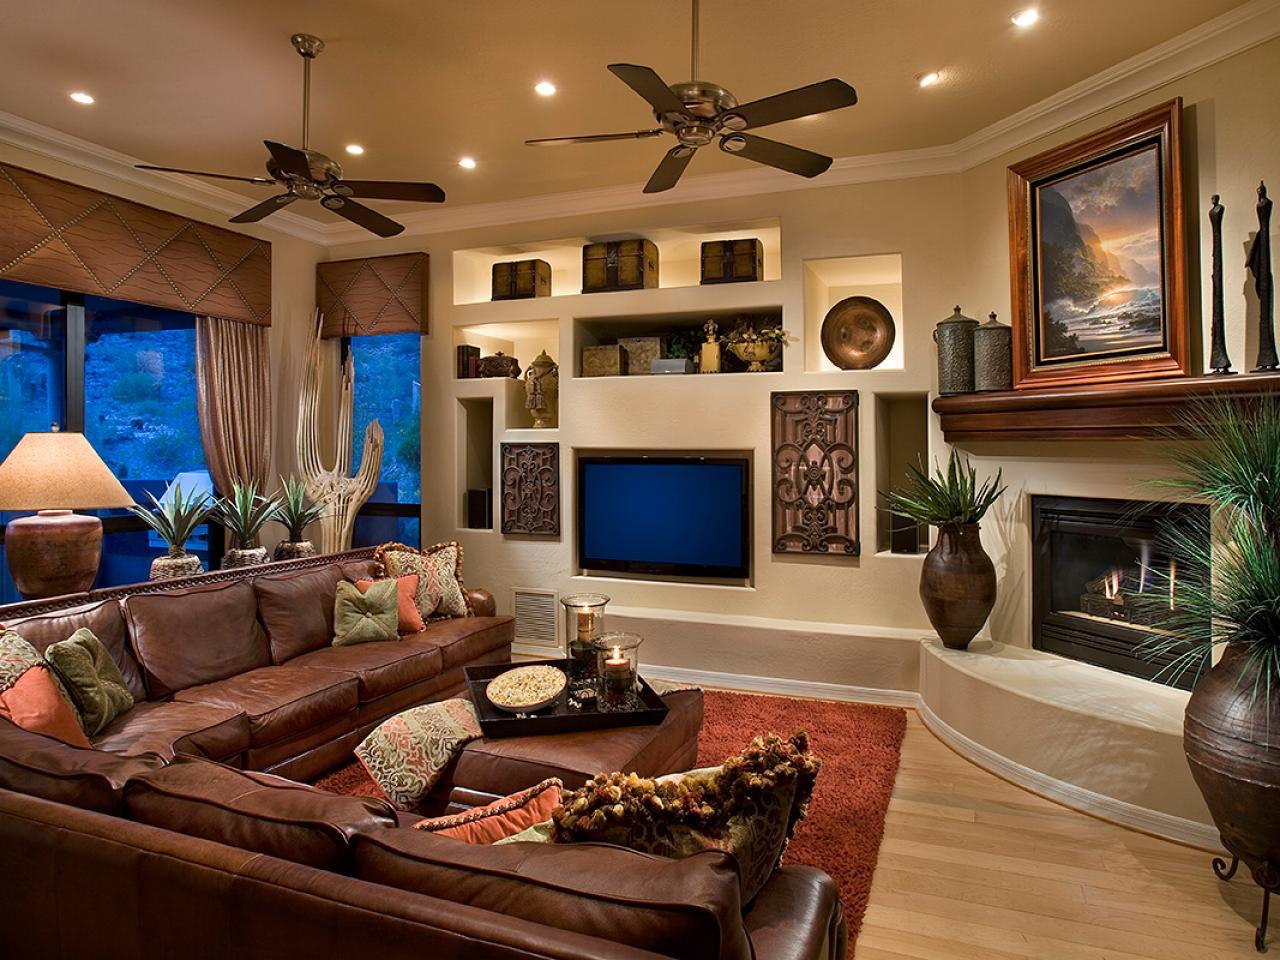 kd_home_interior3.jpeg